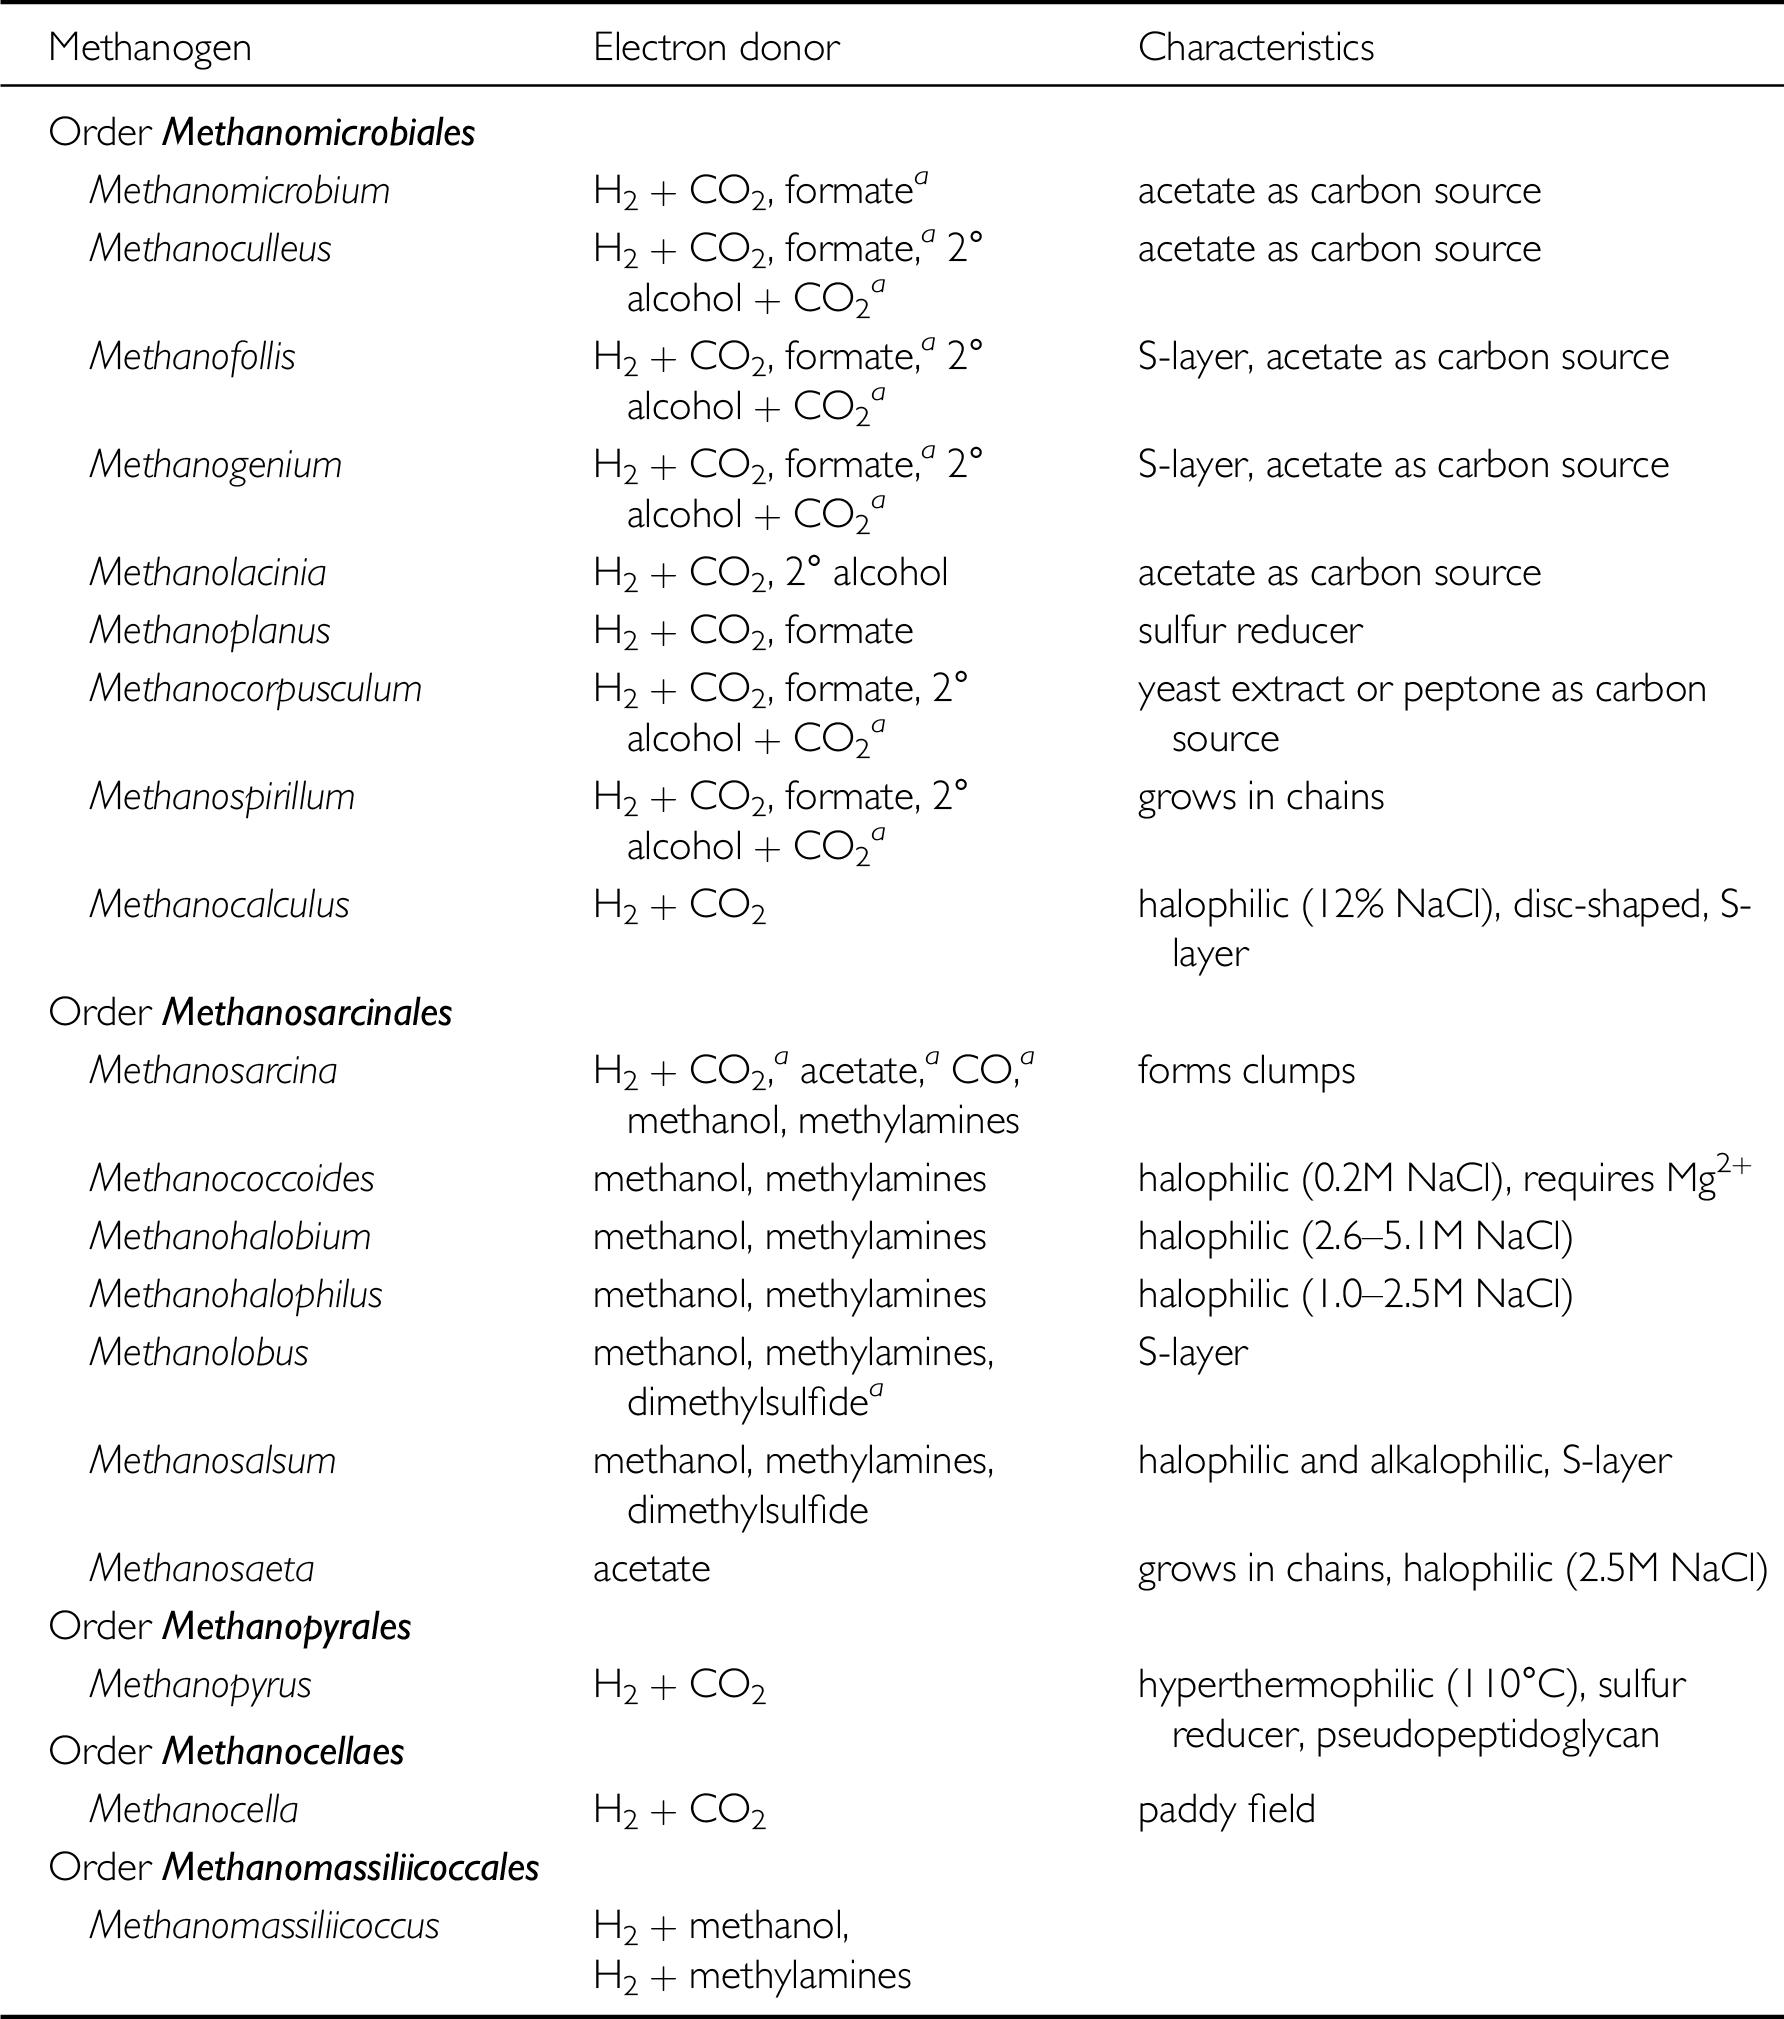 Anaerobic respiration (Chapter 9) - Prokaryotic Metabolism